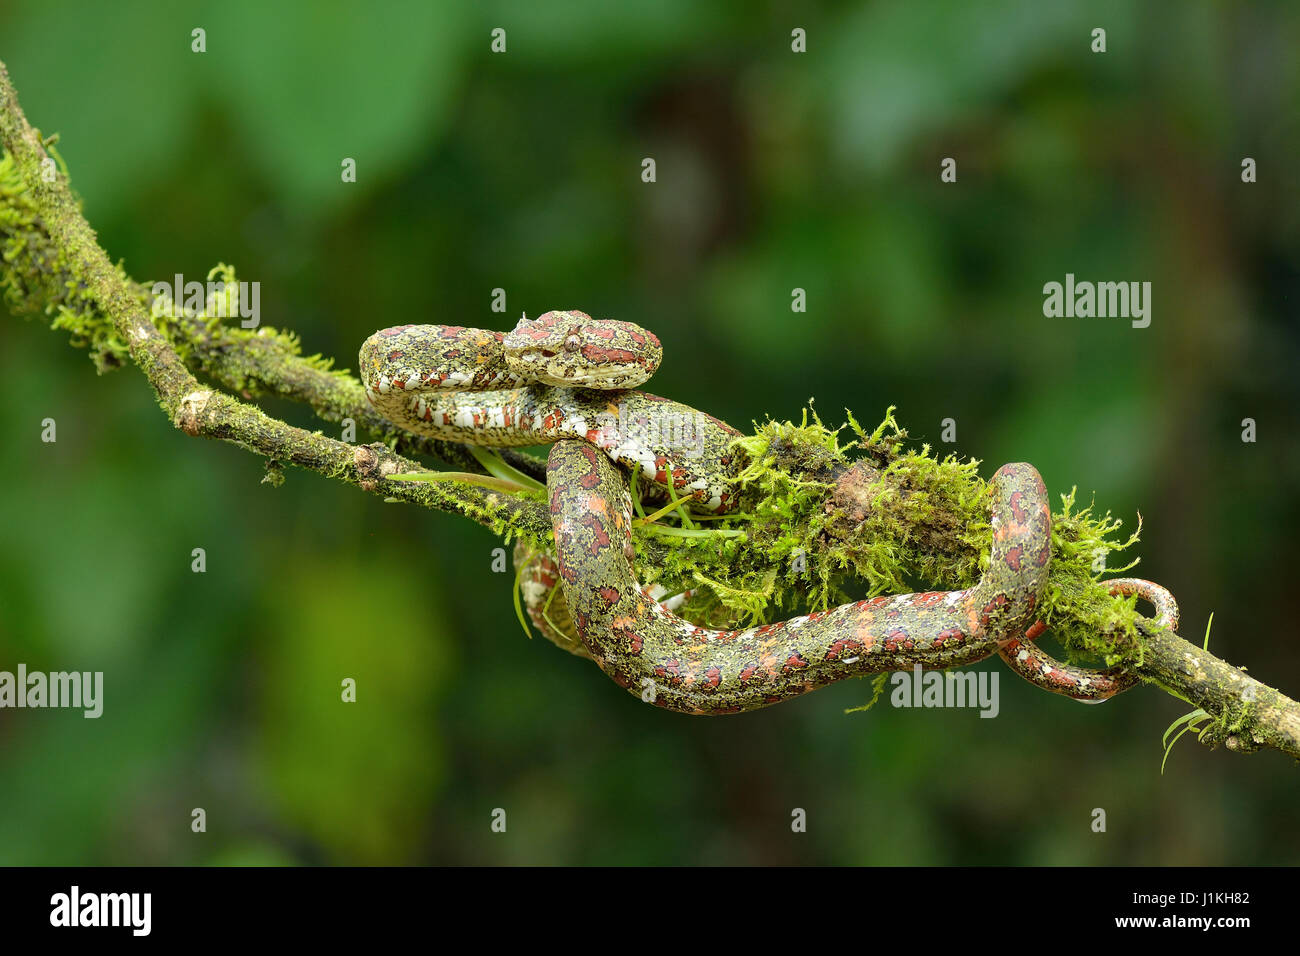 Wimpern Palm Pitviper in Costa Rica-tropischer Regenwald Stockbild